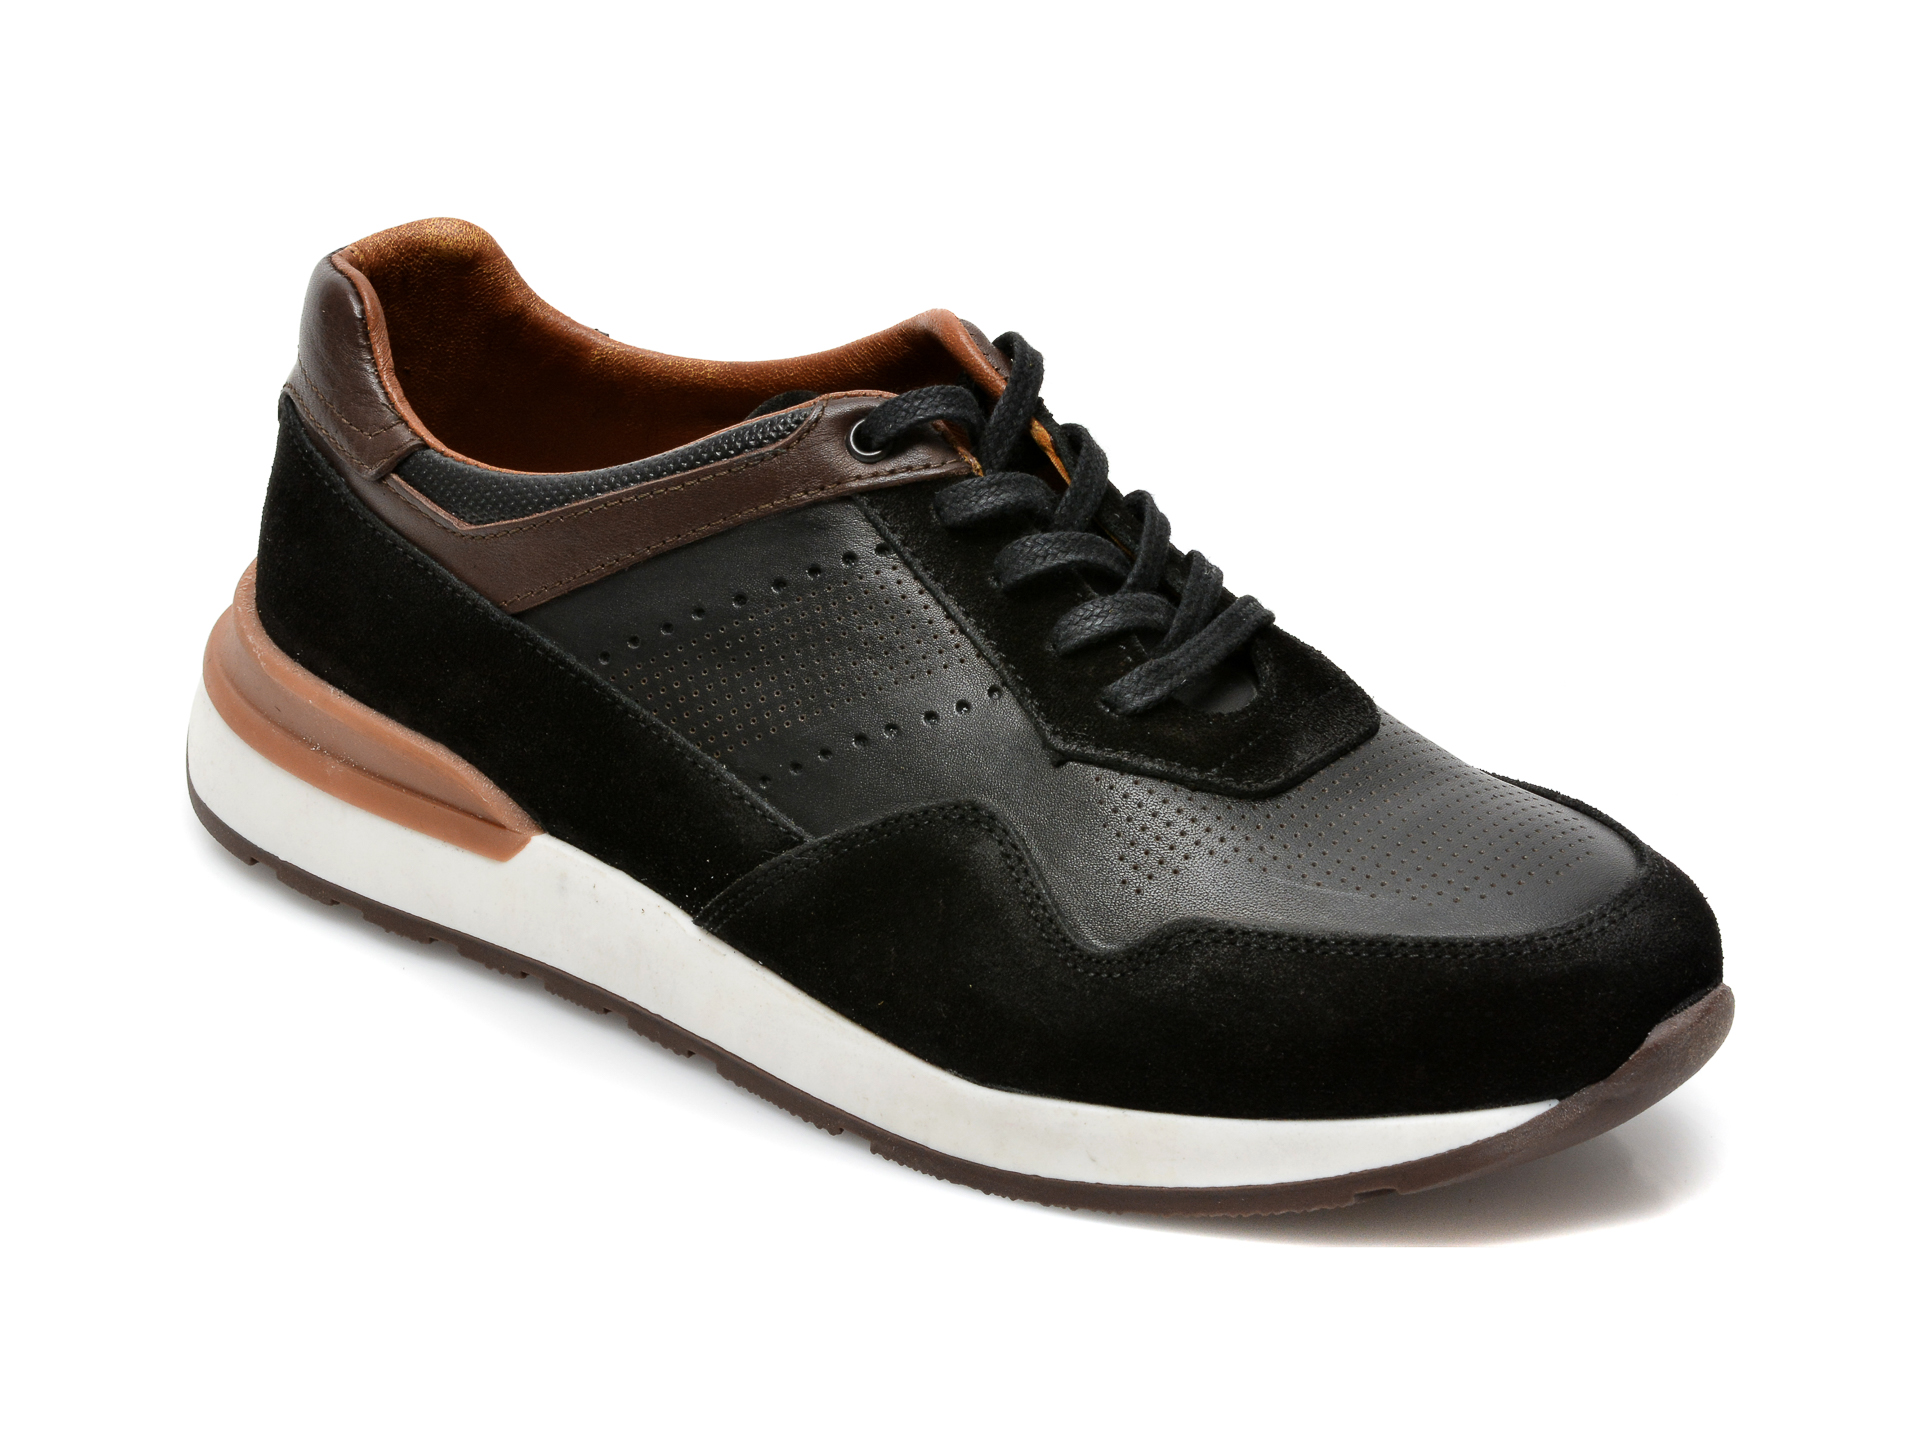 Pantofi OTTER negri, M6039, din piele naturala